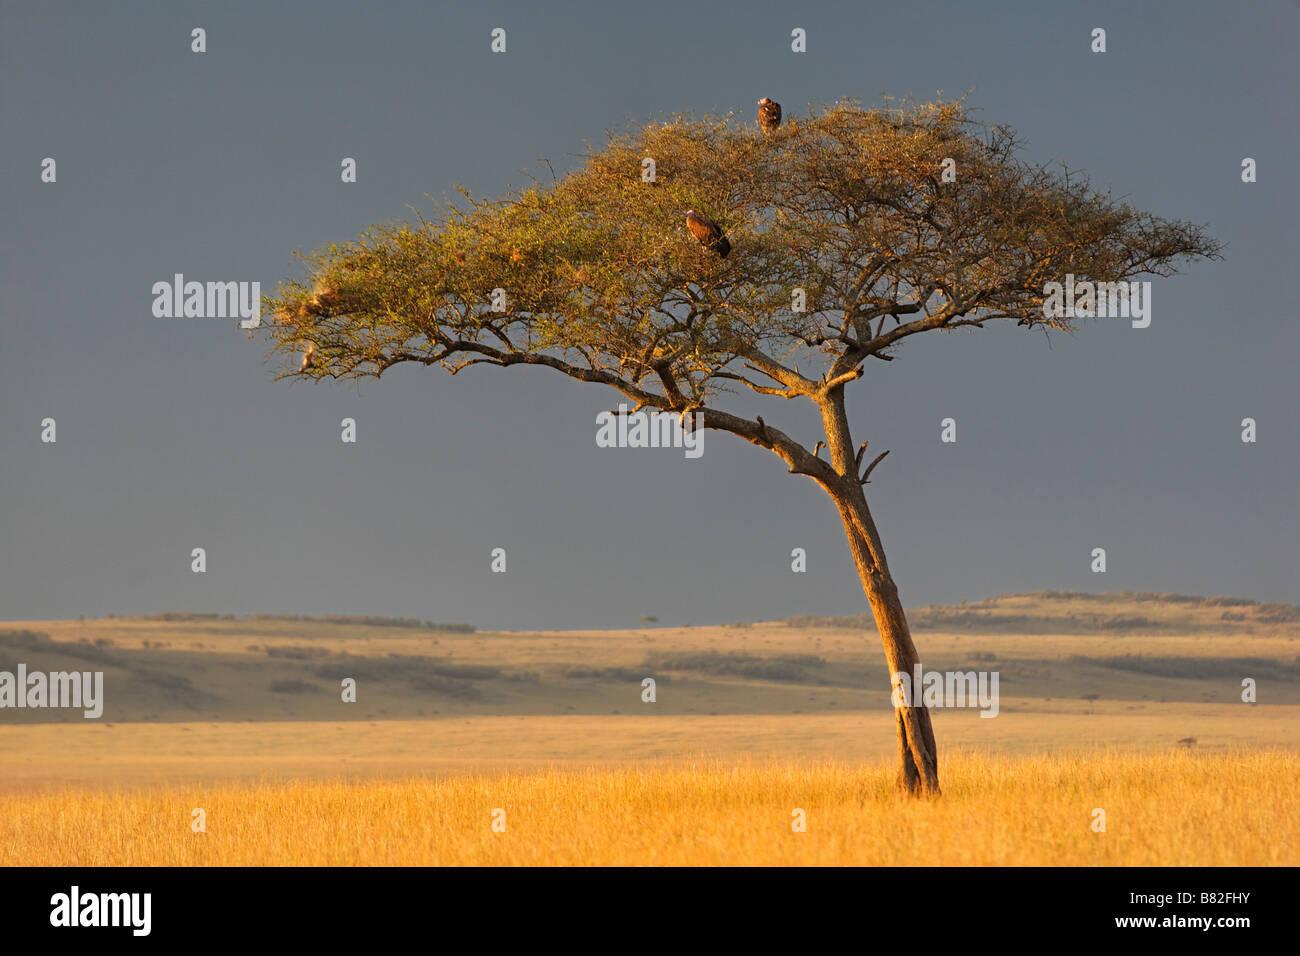 Acacia tree stands along on the golden grasses of the Serengeti in Masai mara National Reserve, Kenya. Stock Photo